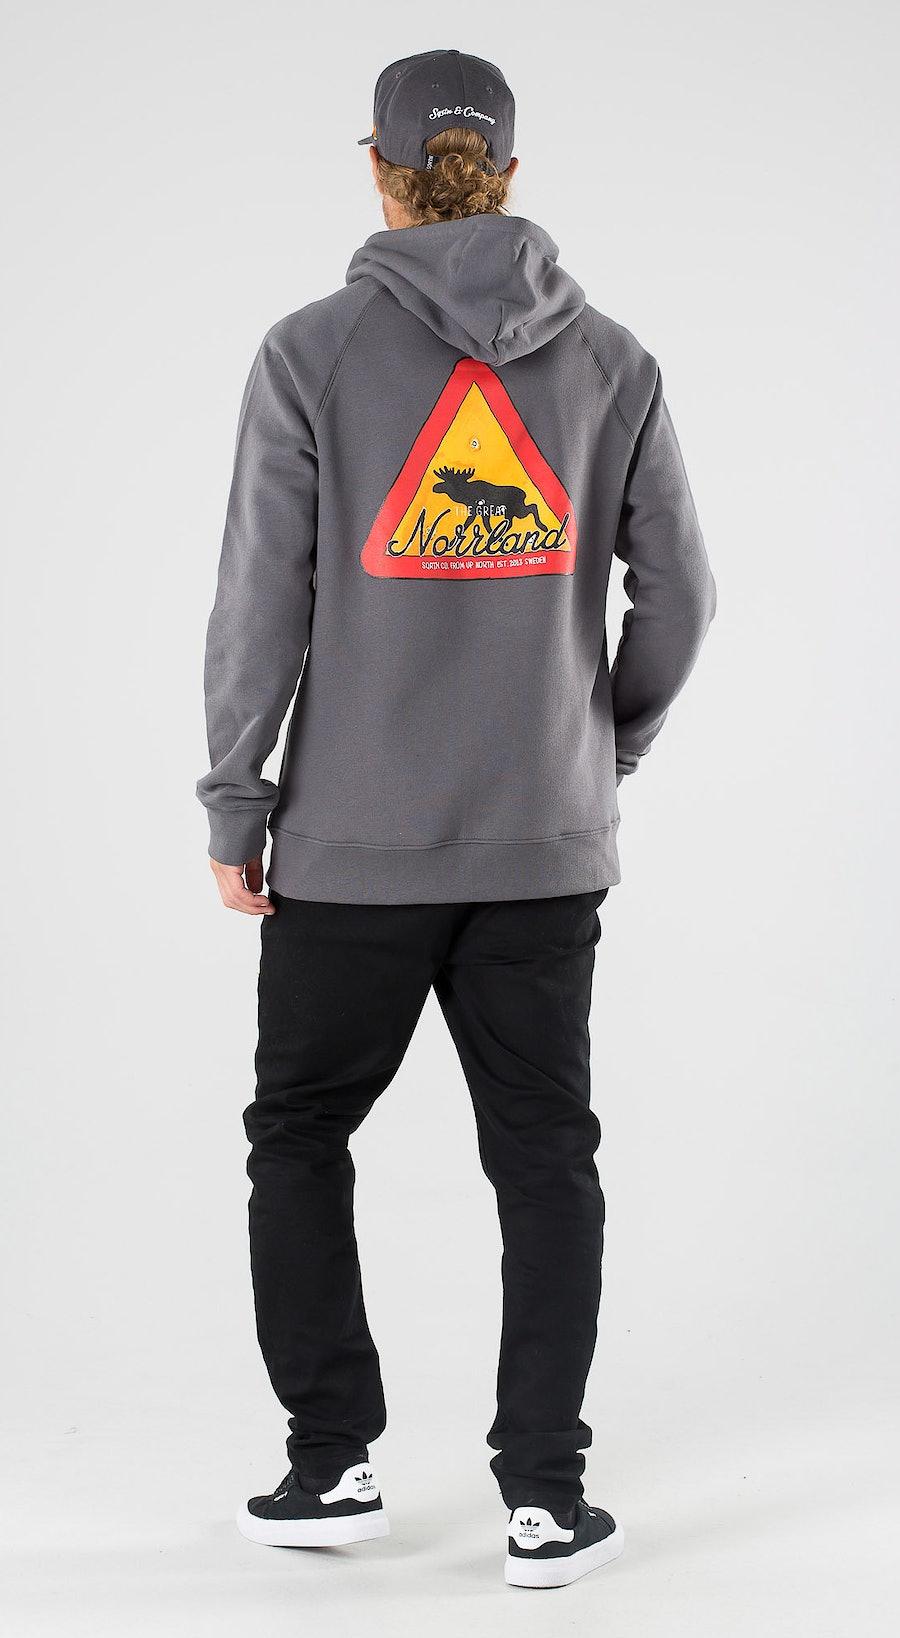 SQRTN Warning Zip Dark Grey Outfit Multi